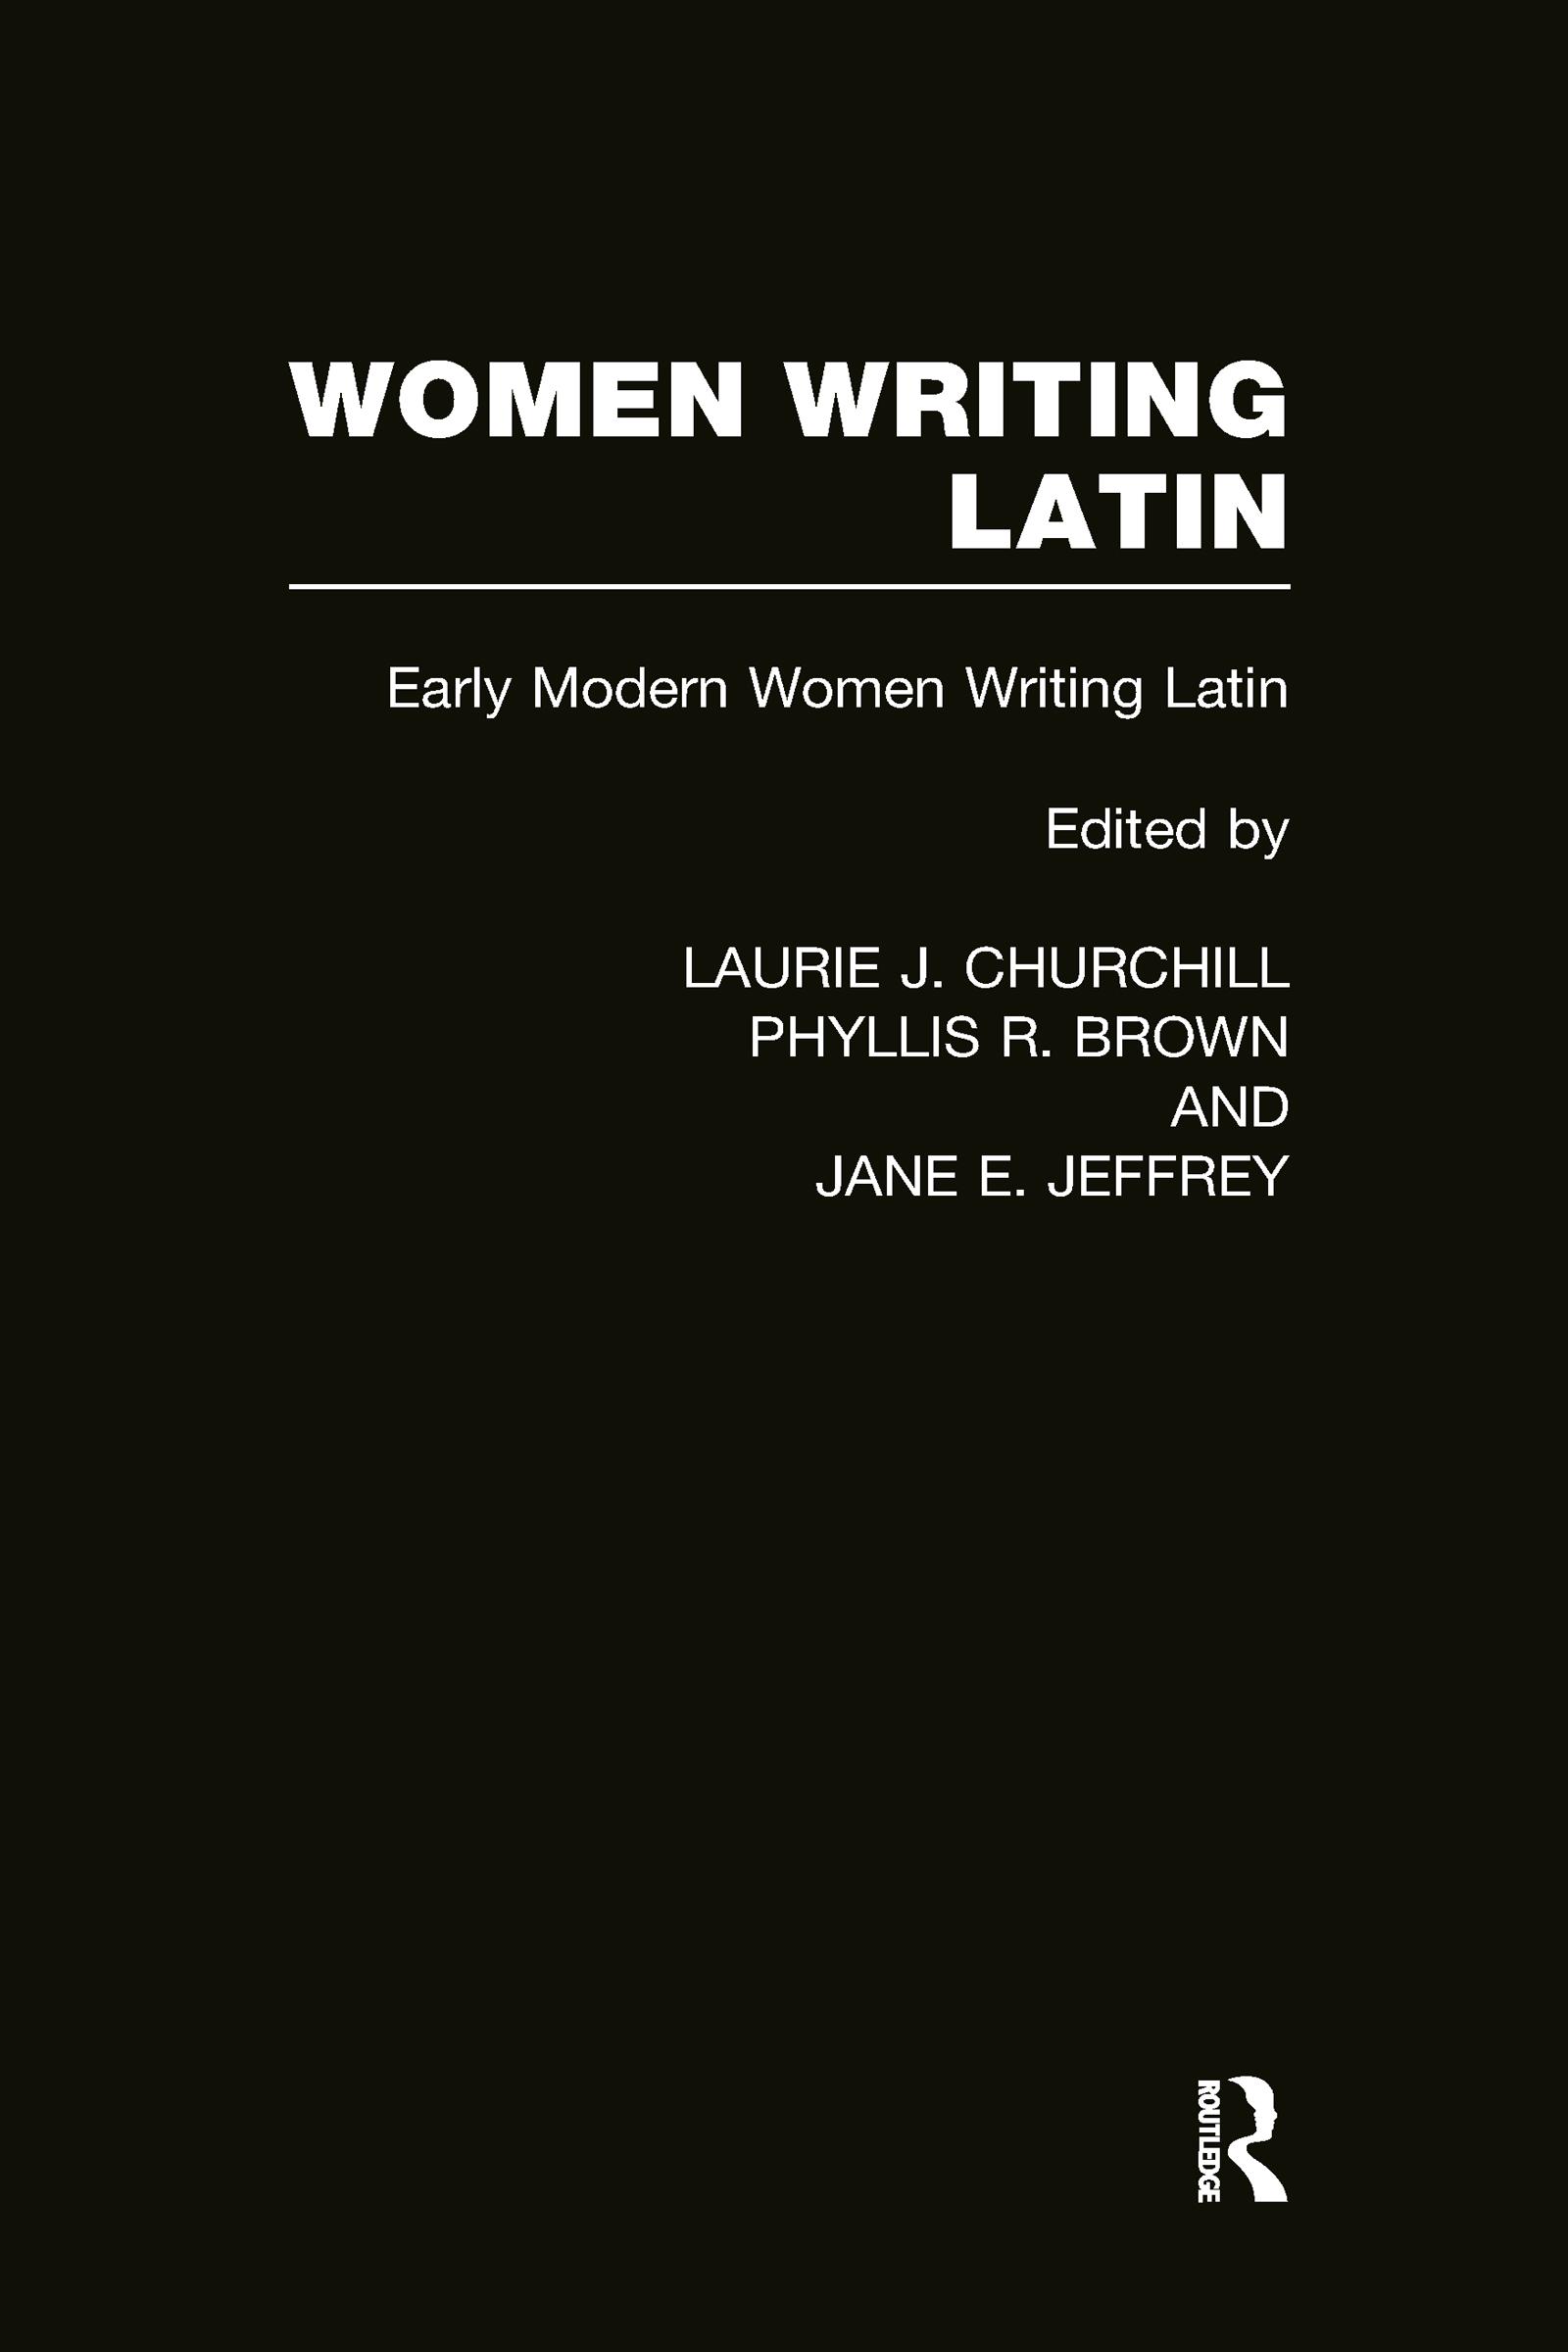 Women Writing Latin: Early Modern Women Writing Latin (Hardback) book cover